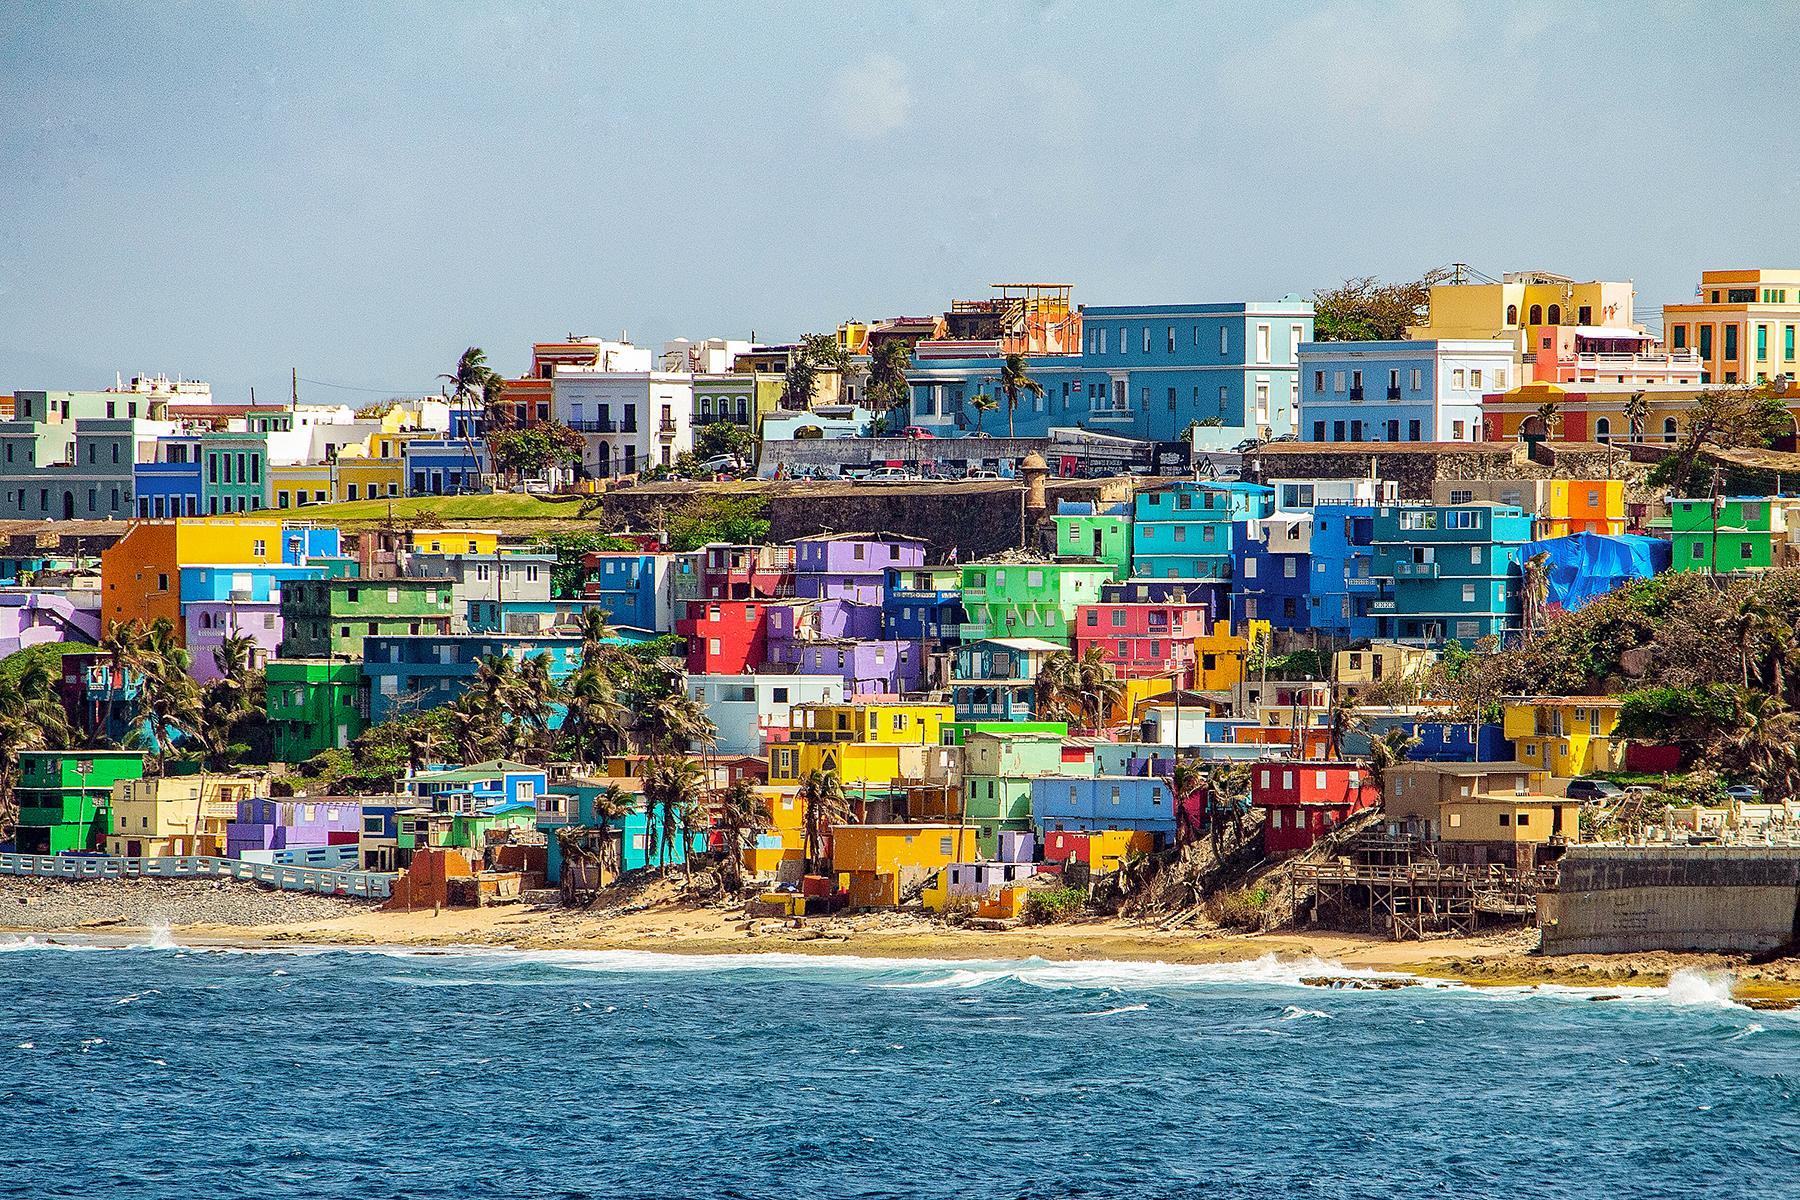 Puerto Rico Caribbean island reopening